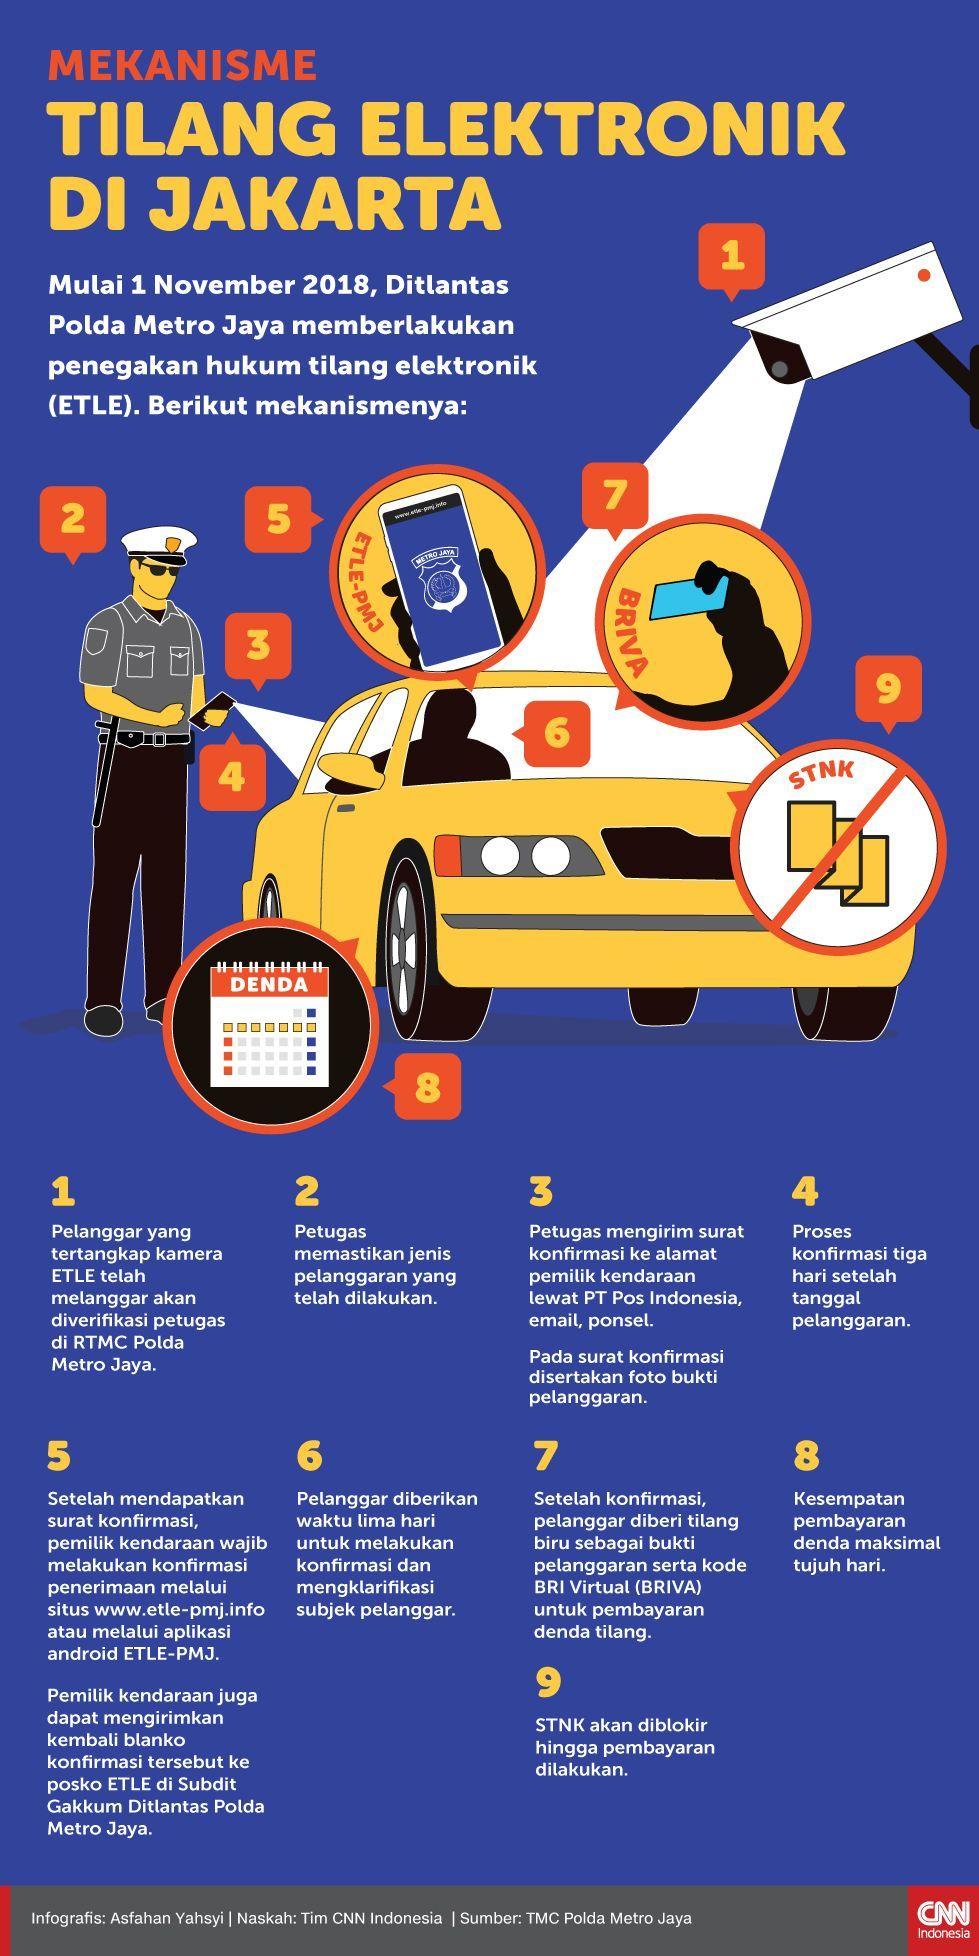 Infografis Mekanisme Tilang Elektronik di Jakarta